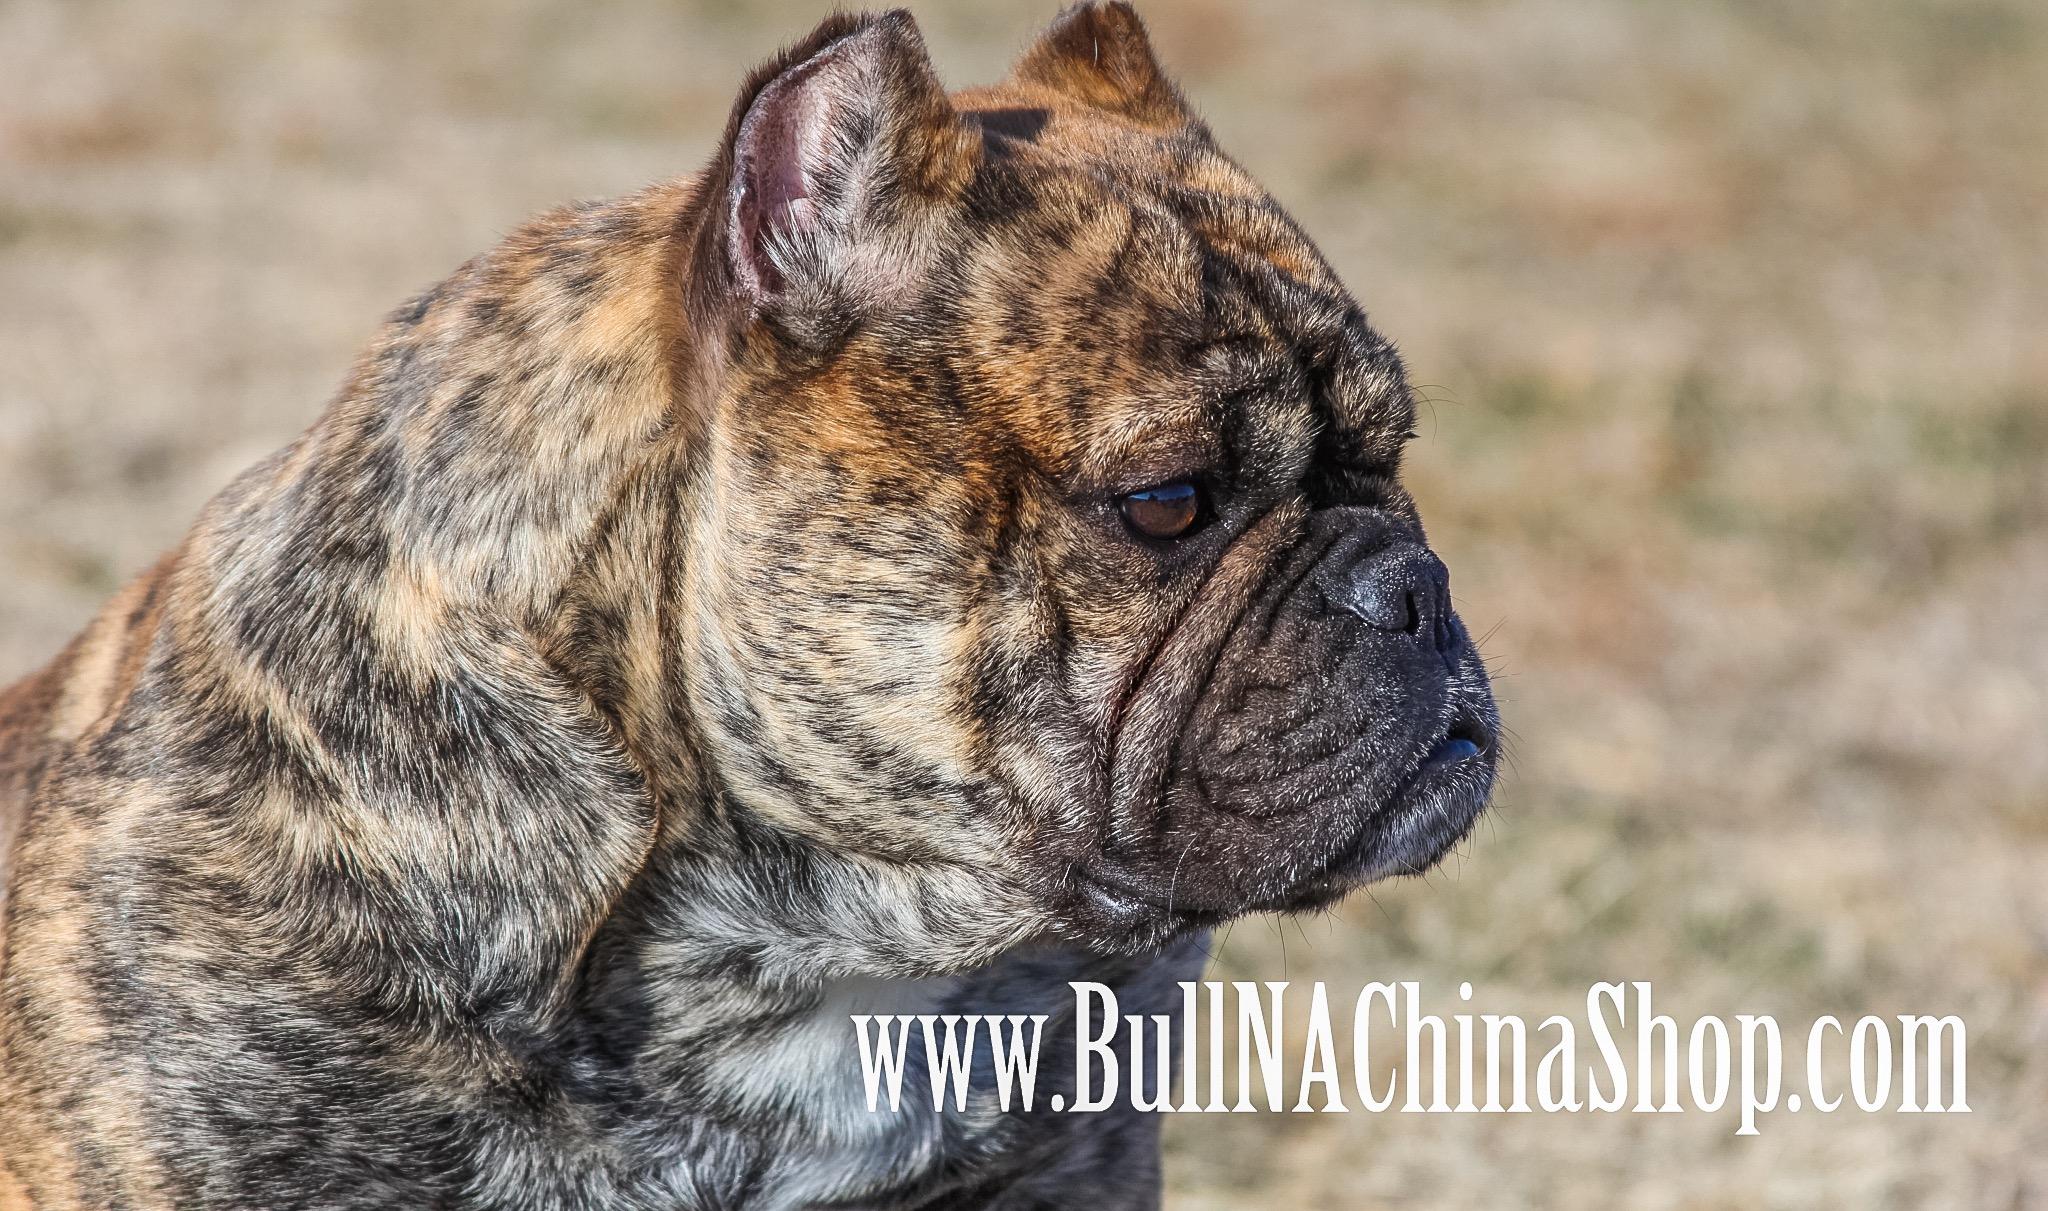 58dd272846 BBC takes firm stance on foundation breedings for SHORTY BULLs! –  www.BullNAChinaShop.com